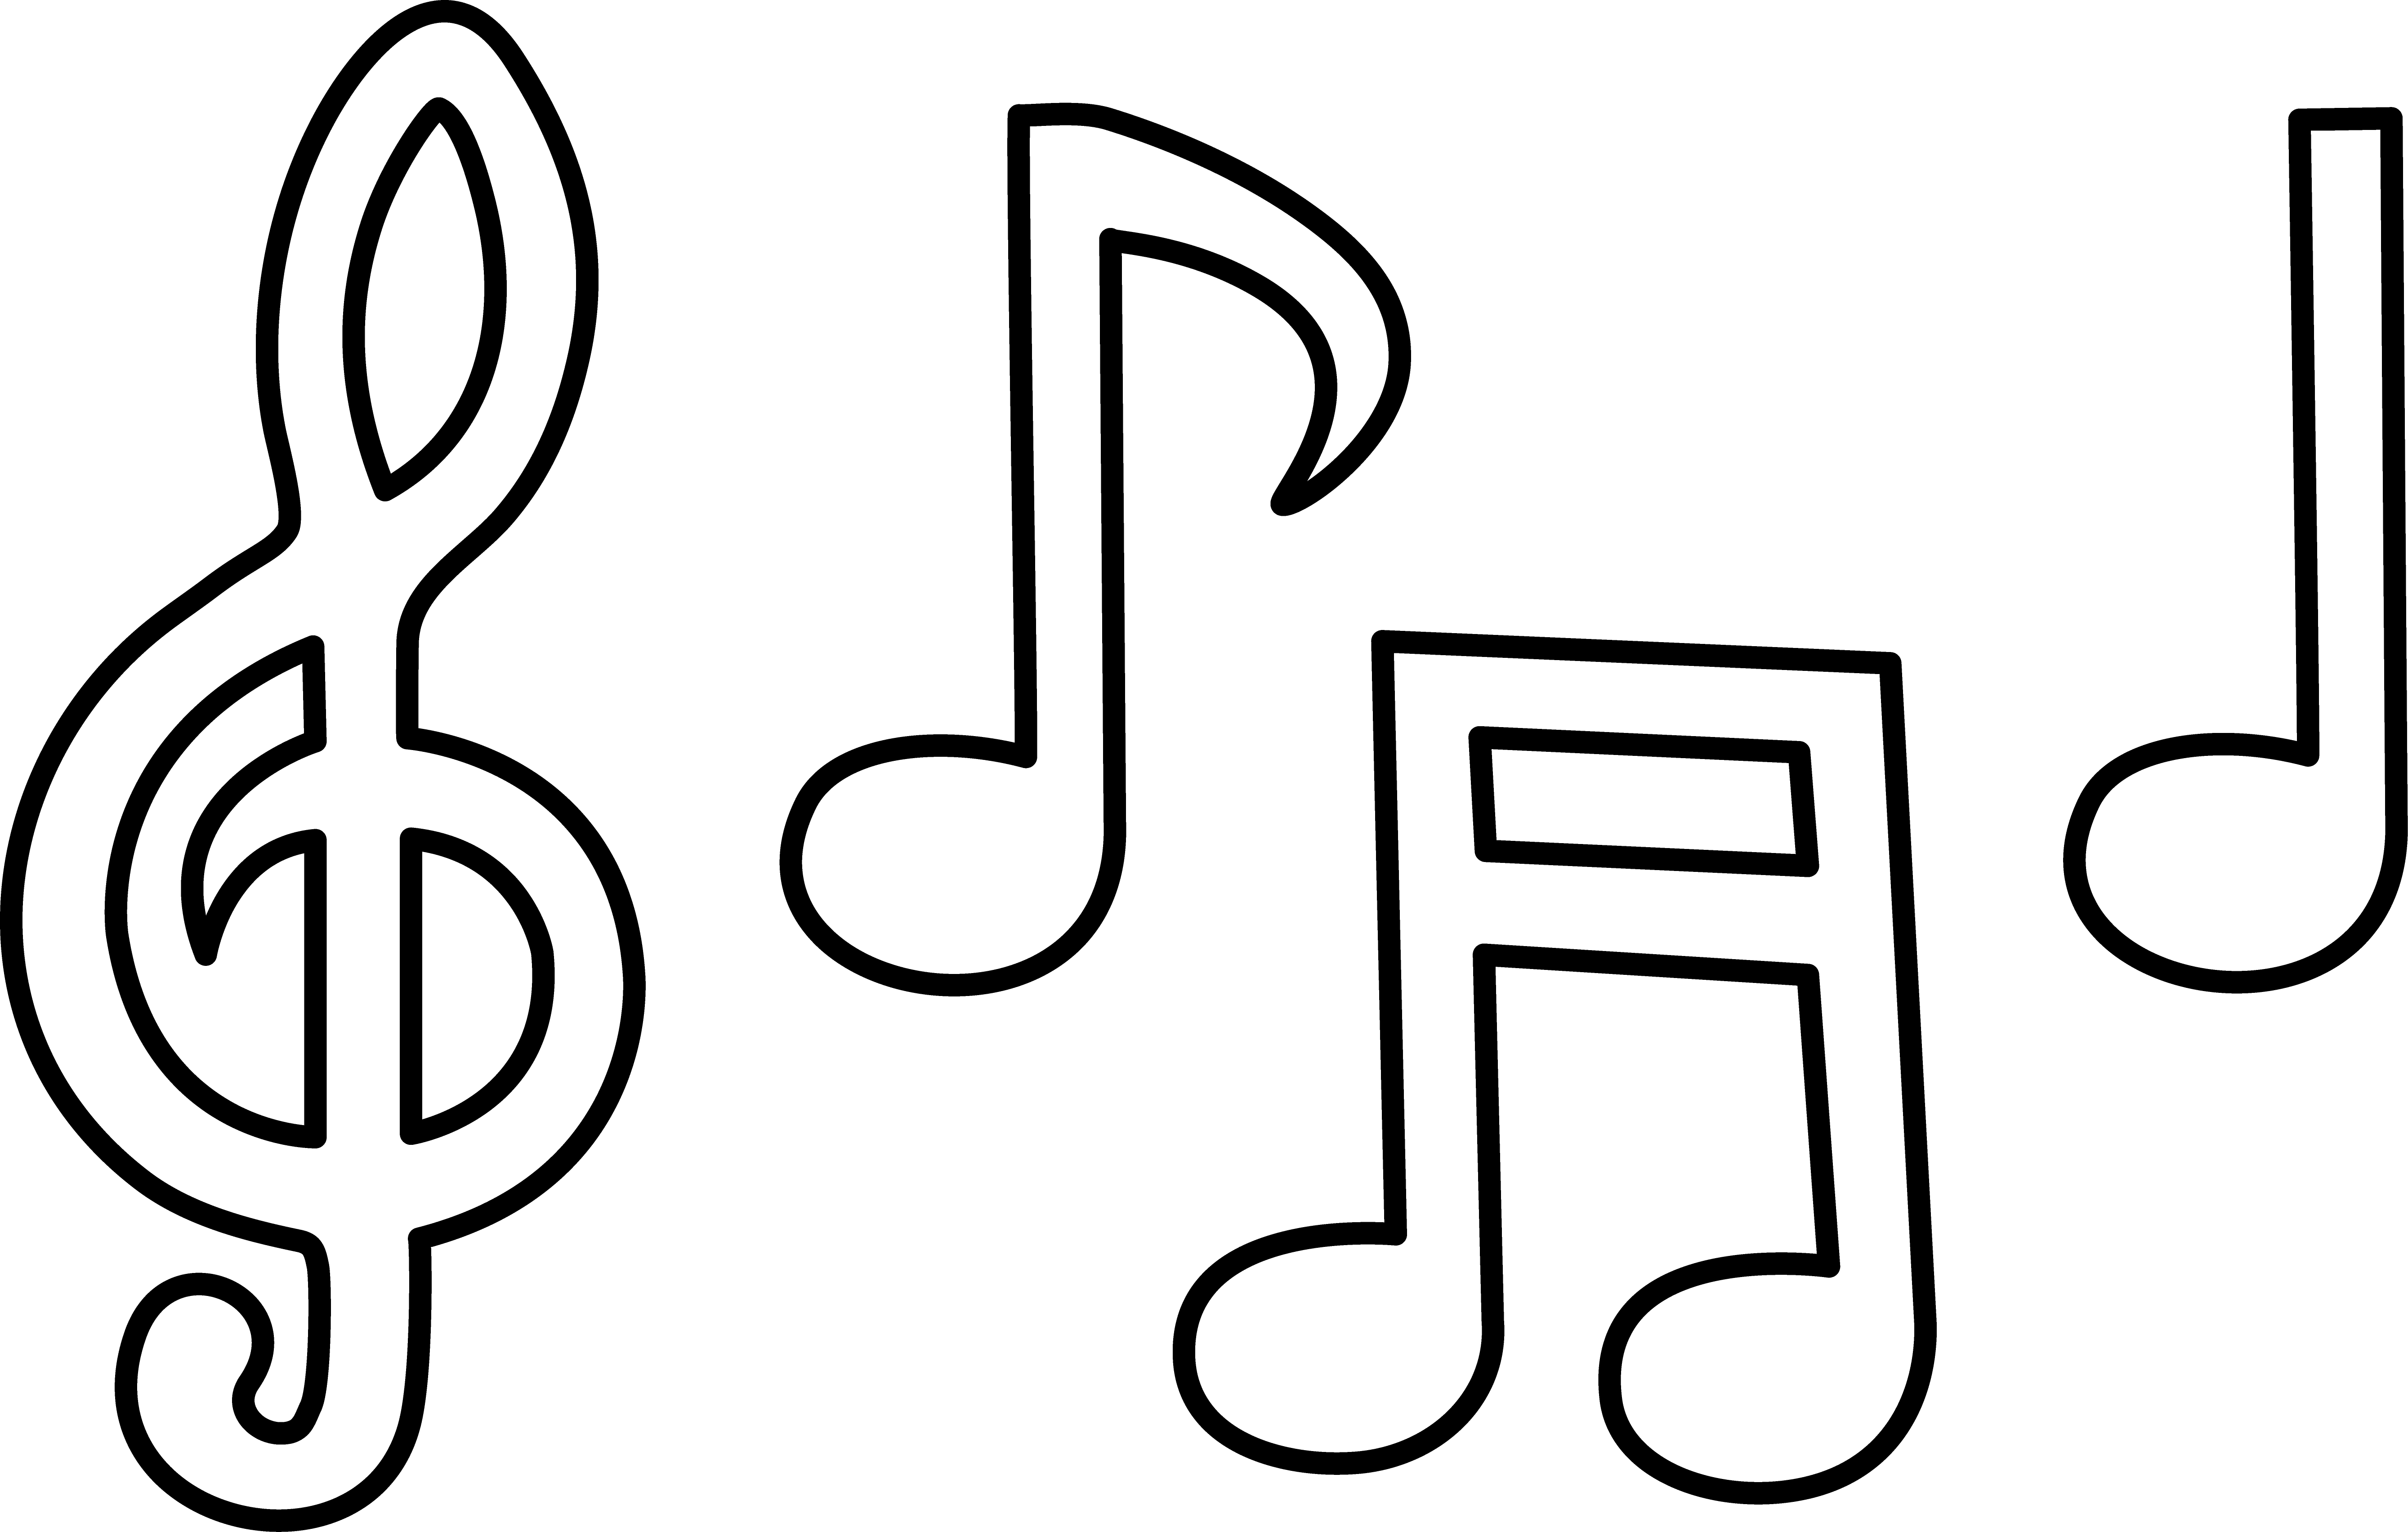 Drawn music notes rap music Clip Art Free Line Free